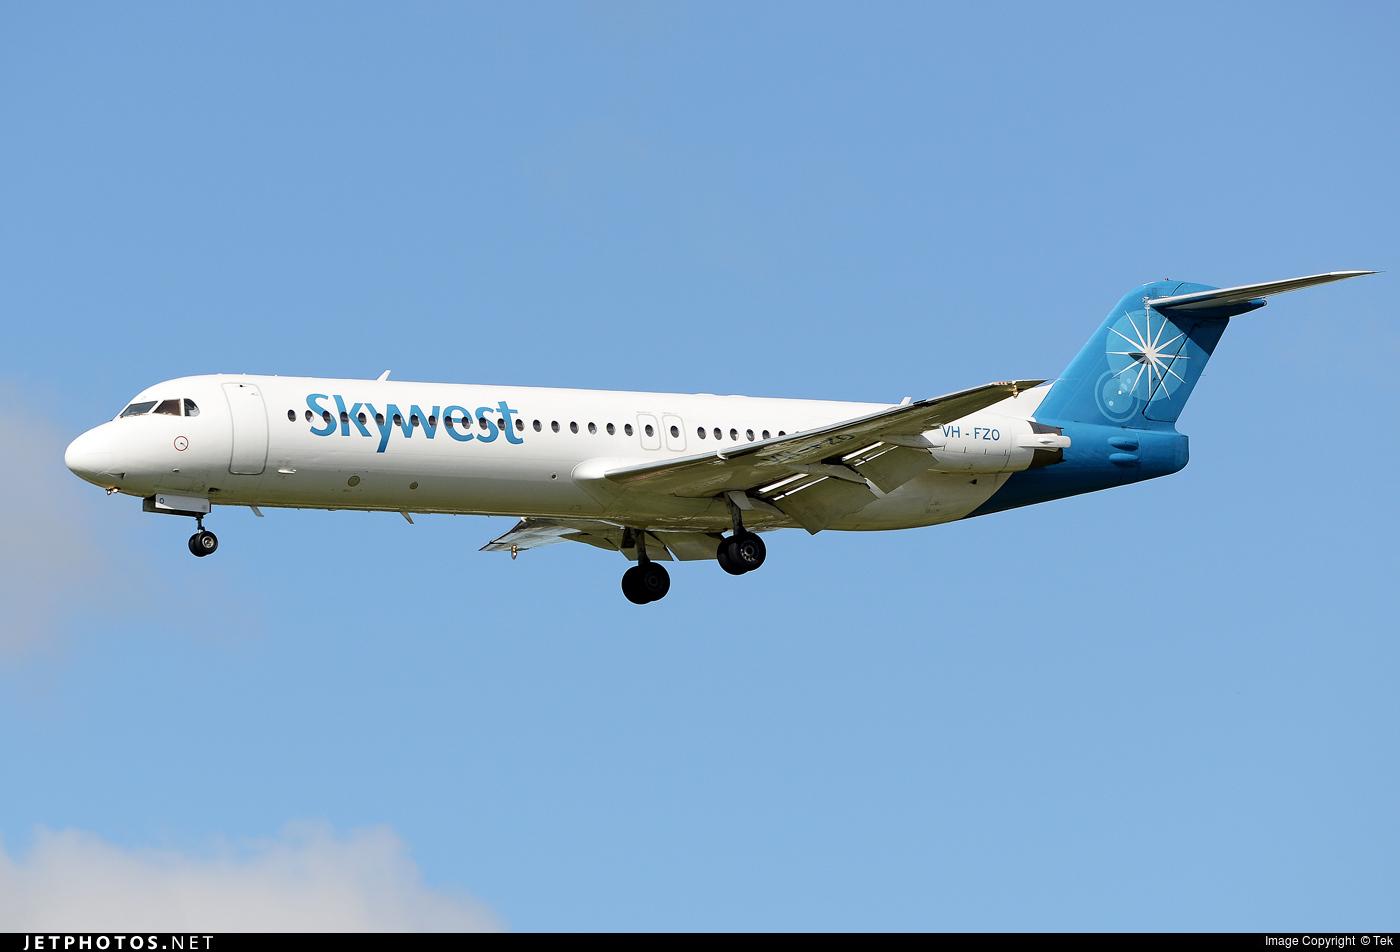 VH-FSW - Skywest Airlines (Australia) Fokker 100 at Perth, WA ...